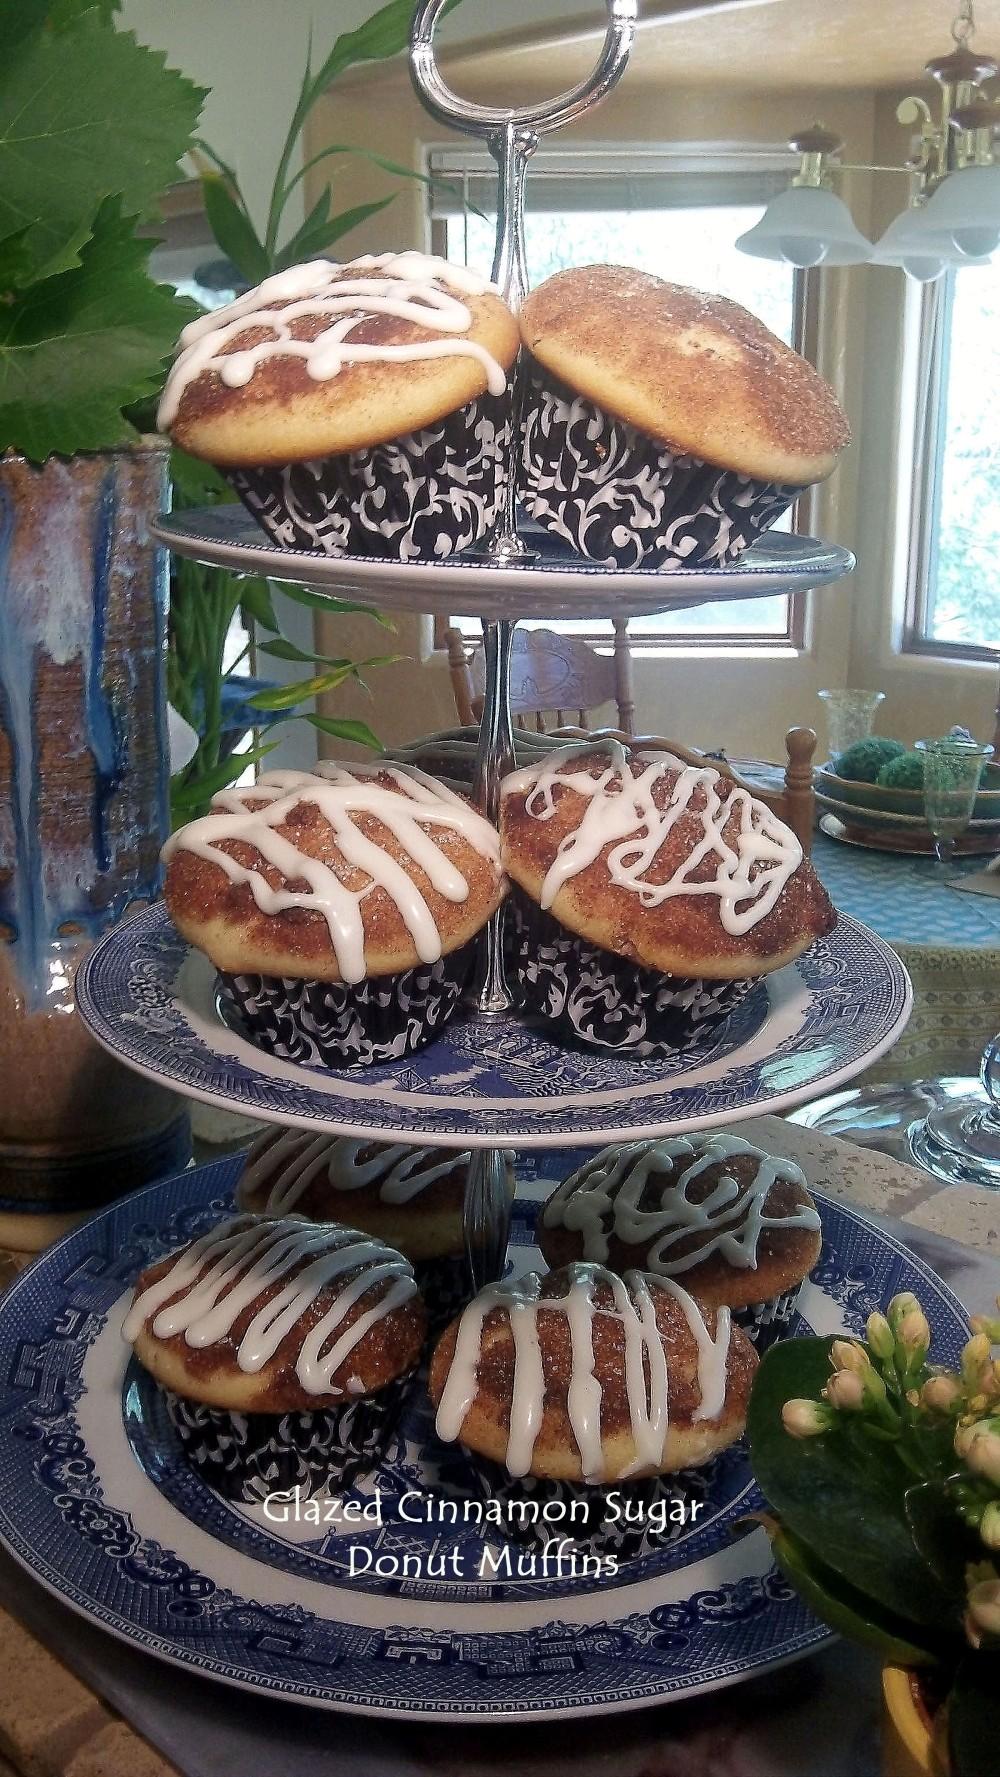 muffins-best-1 copy.jpg